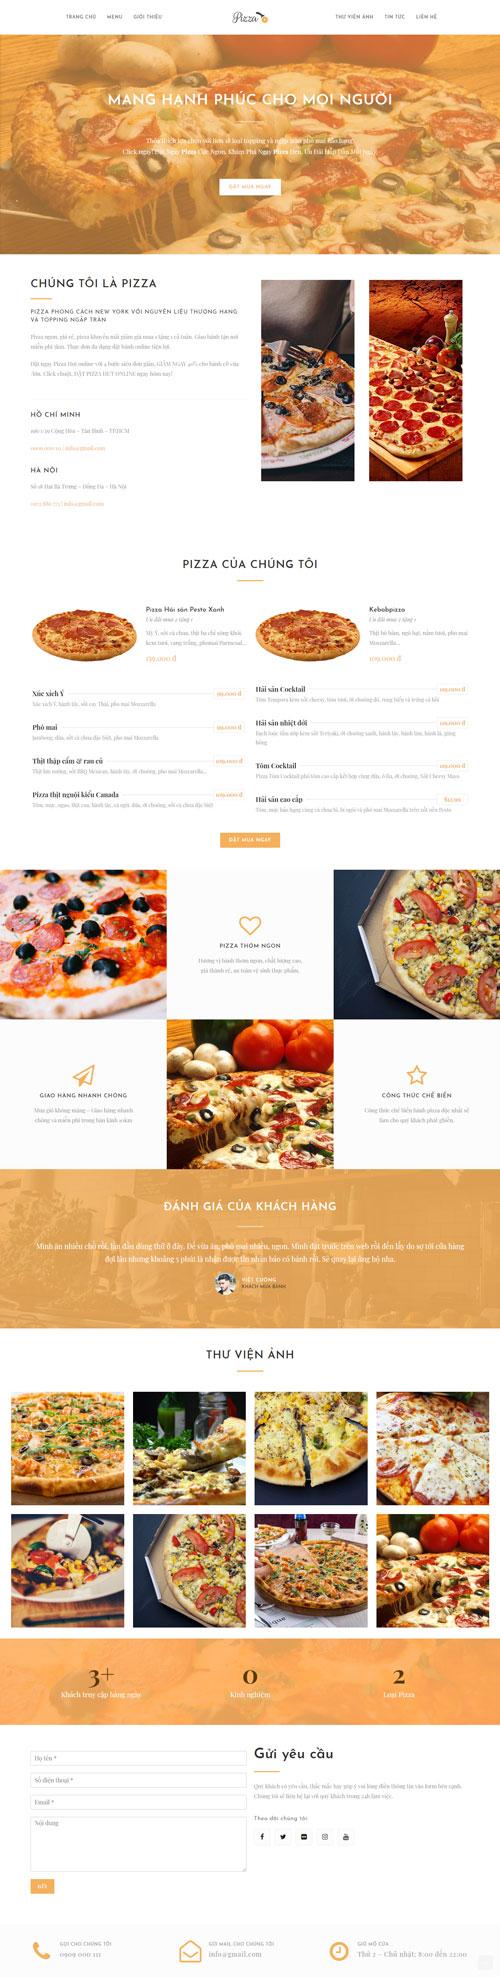 Website bán bánh Pizza 1